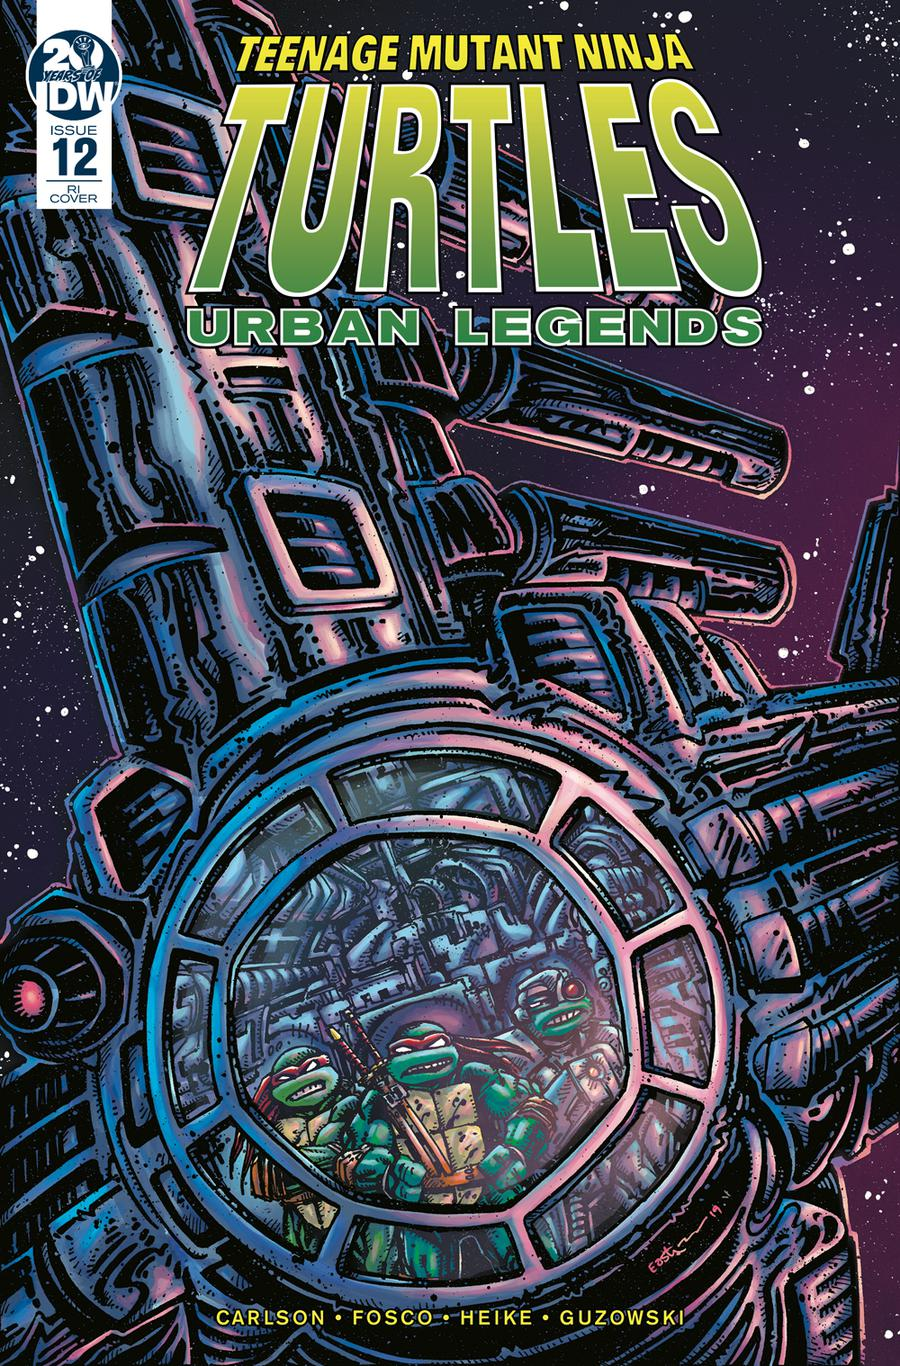 Teenage Mutant Ninja Turtles Urban Legends #12 Cover C Incentive Kevin Eastman Variant Cover